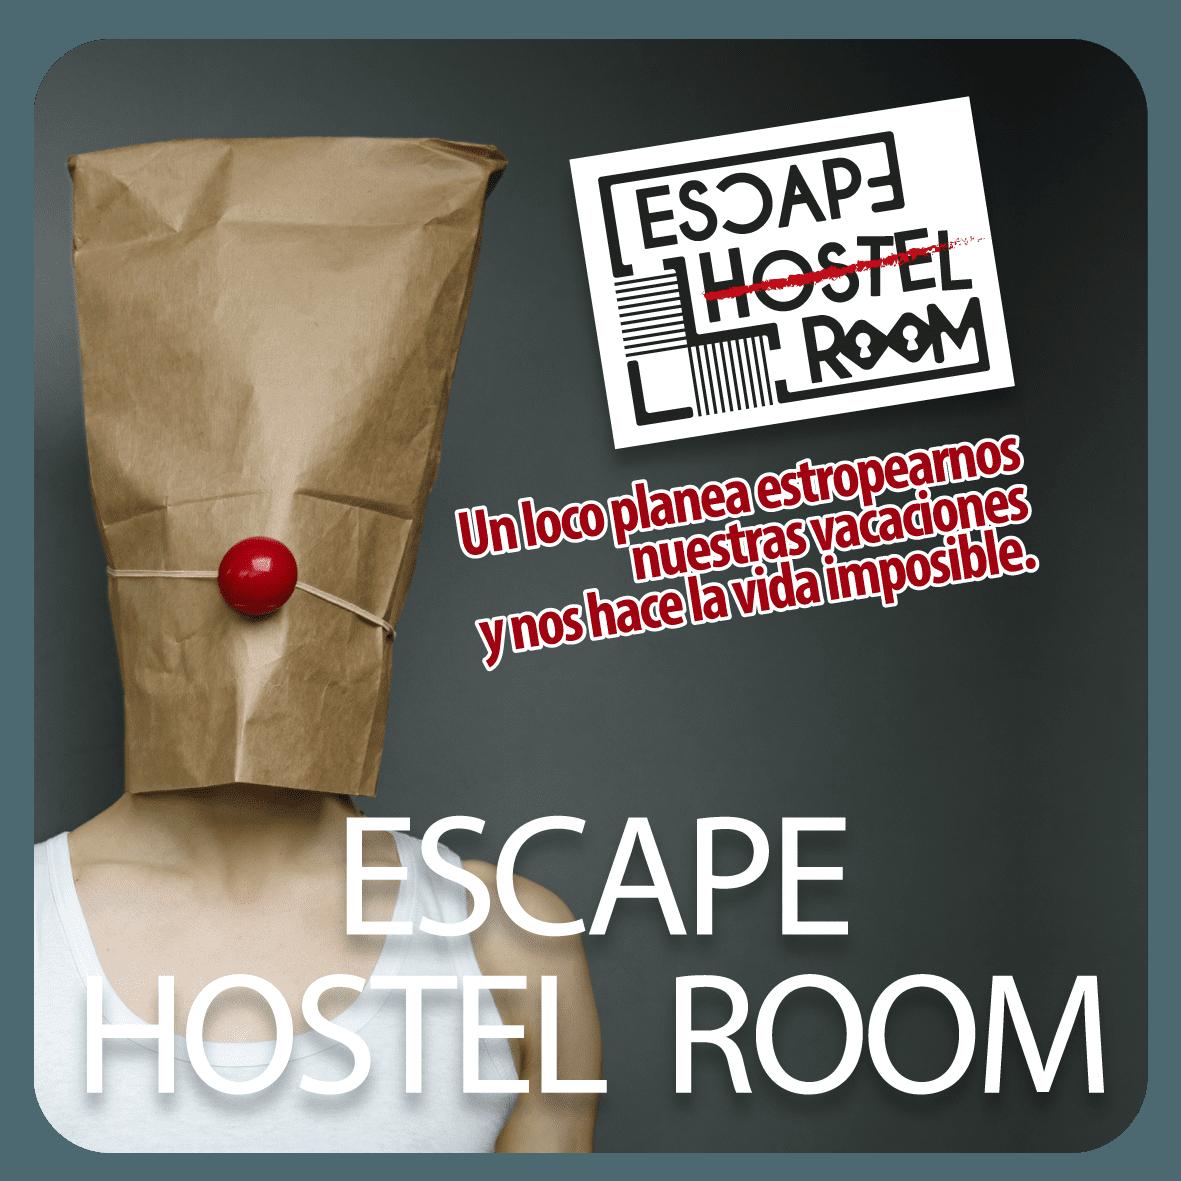 Escape Hostel Room